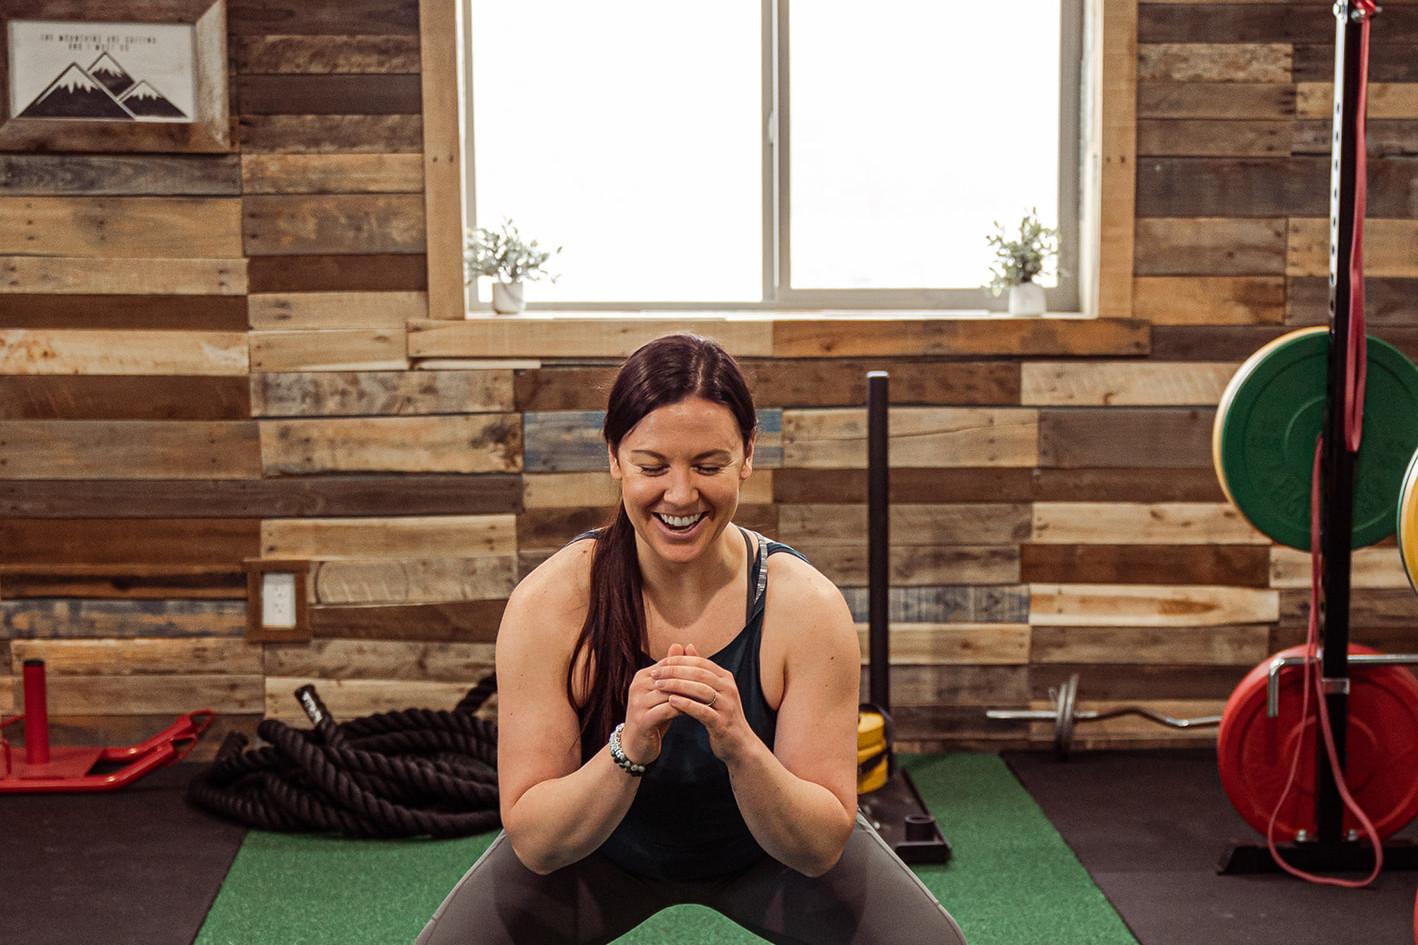 Learn the proper techniques for an efficient Squat!